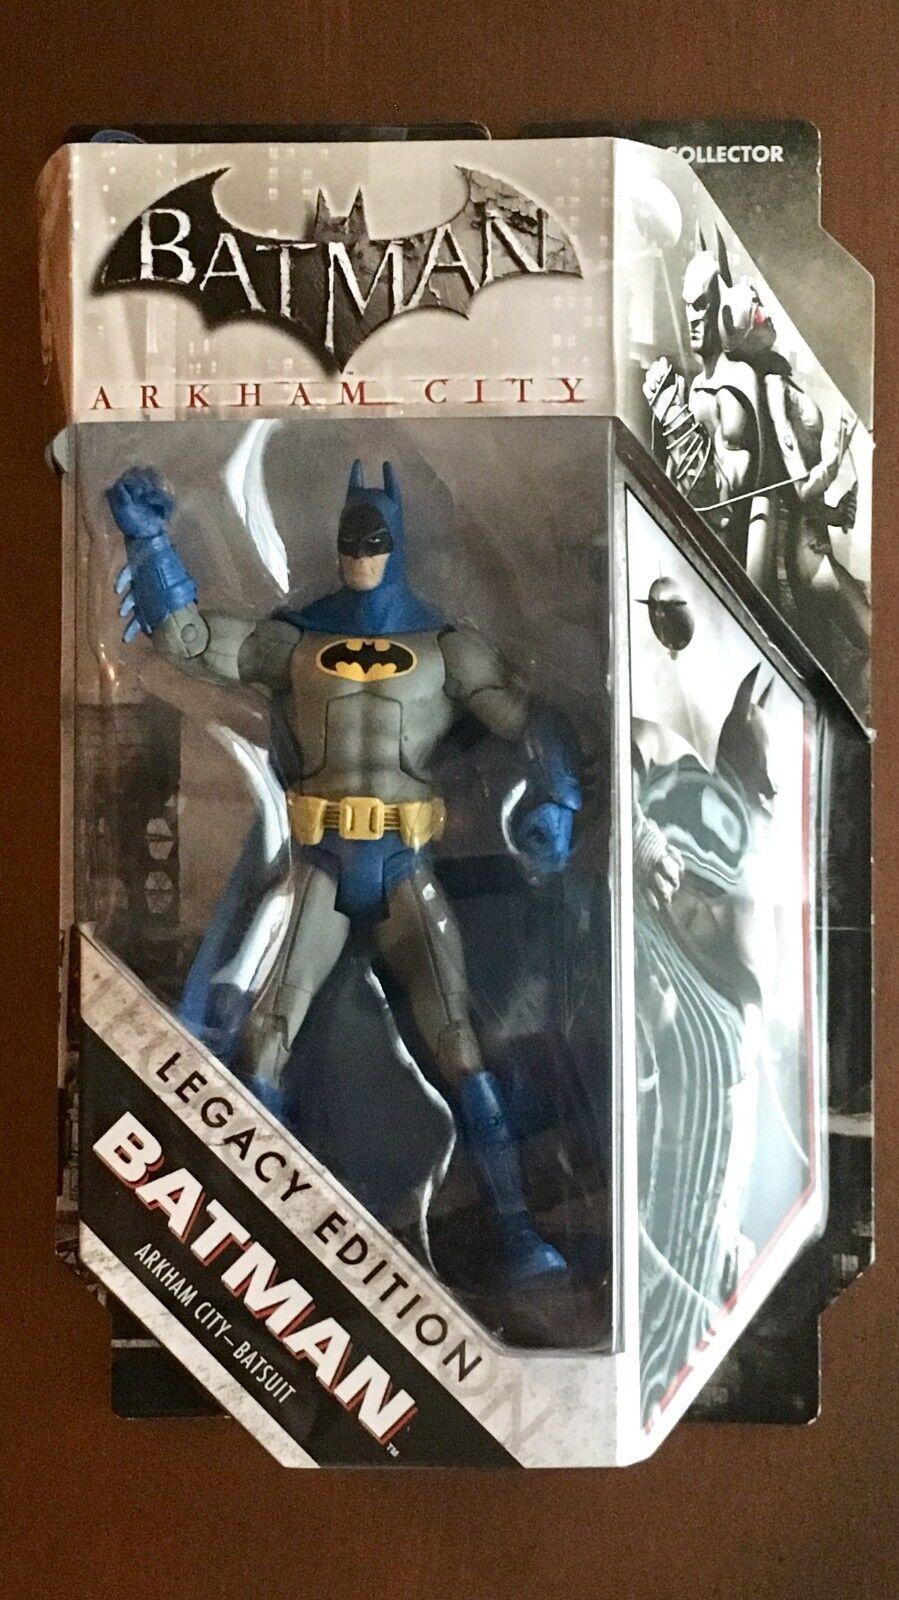 BRAND NEW DC Universe Batman Legacy Edition Batman Arkham City Batsuit Mattel